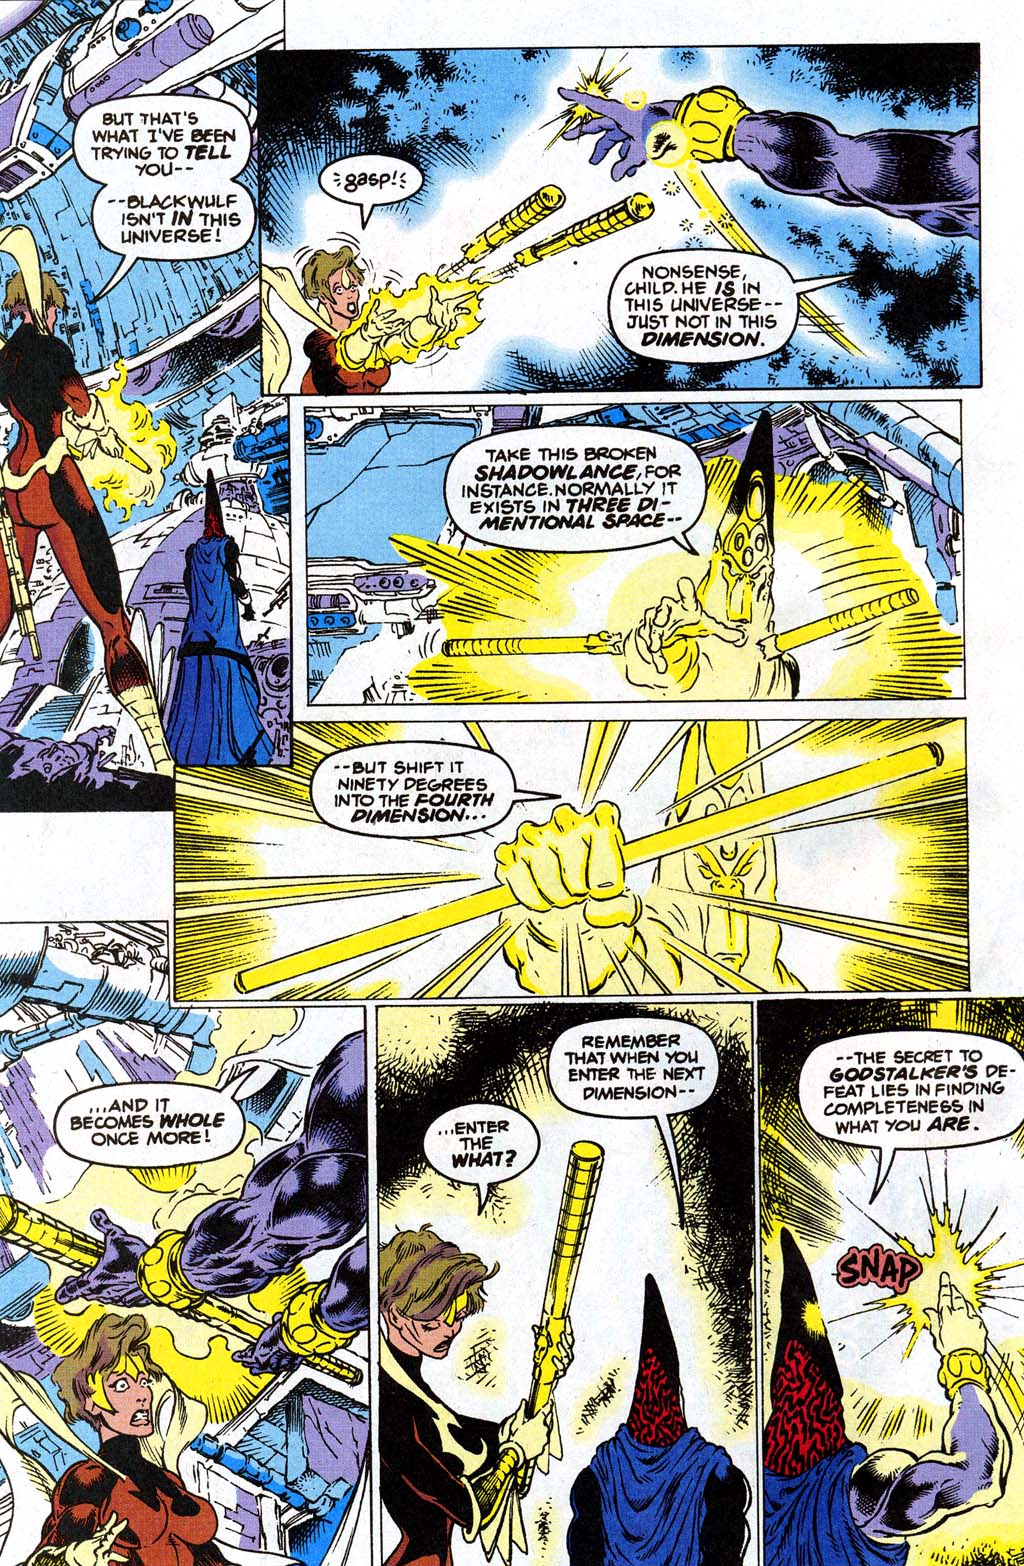 Read online Blackwulf comic -  Issue #9 - 16